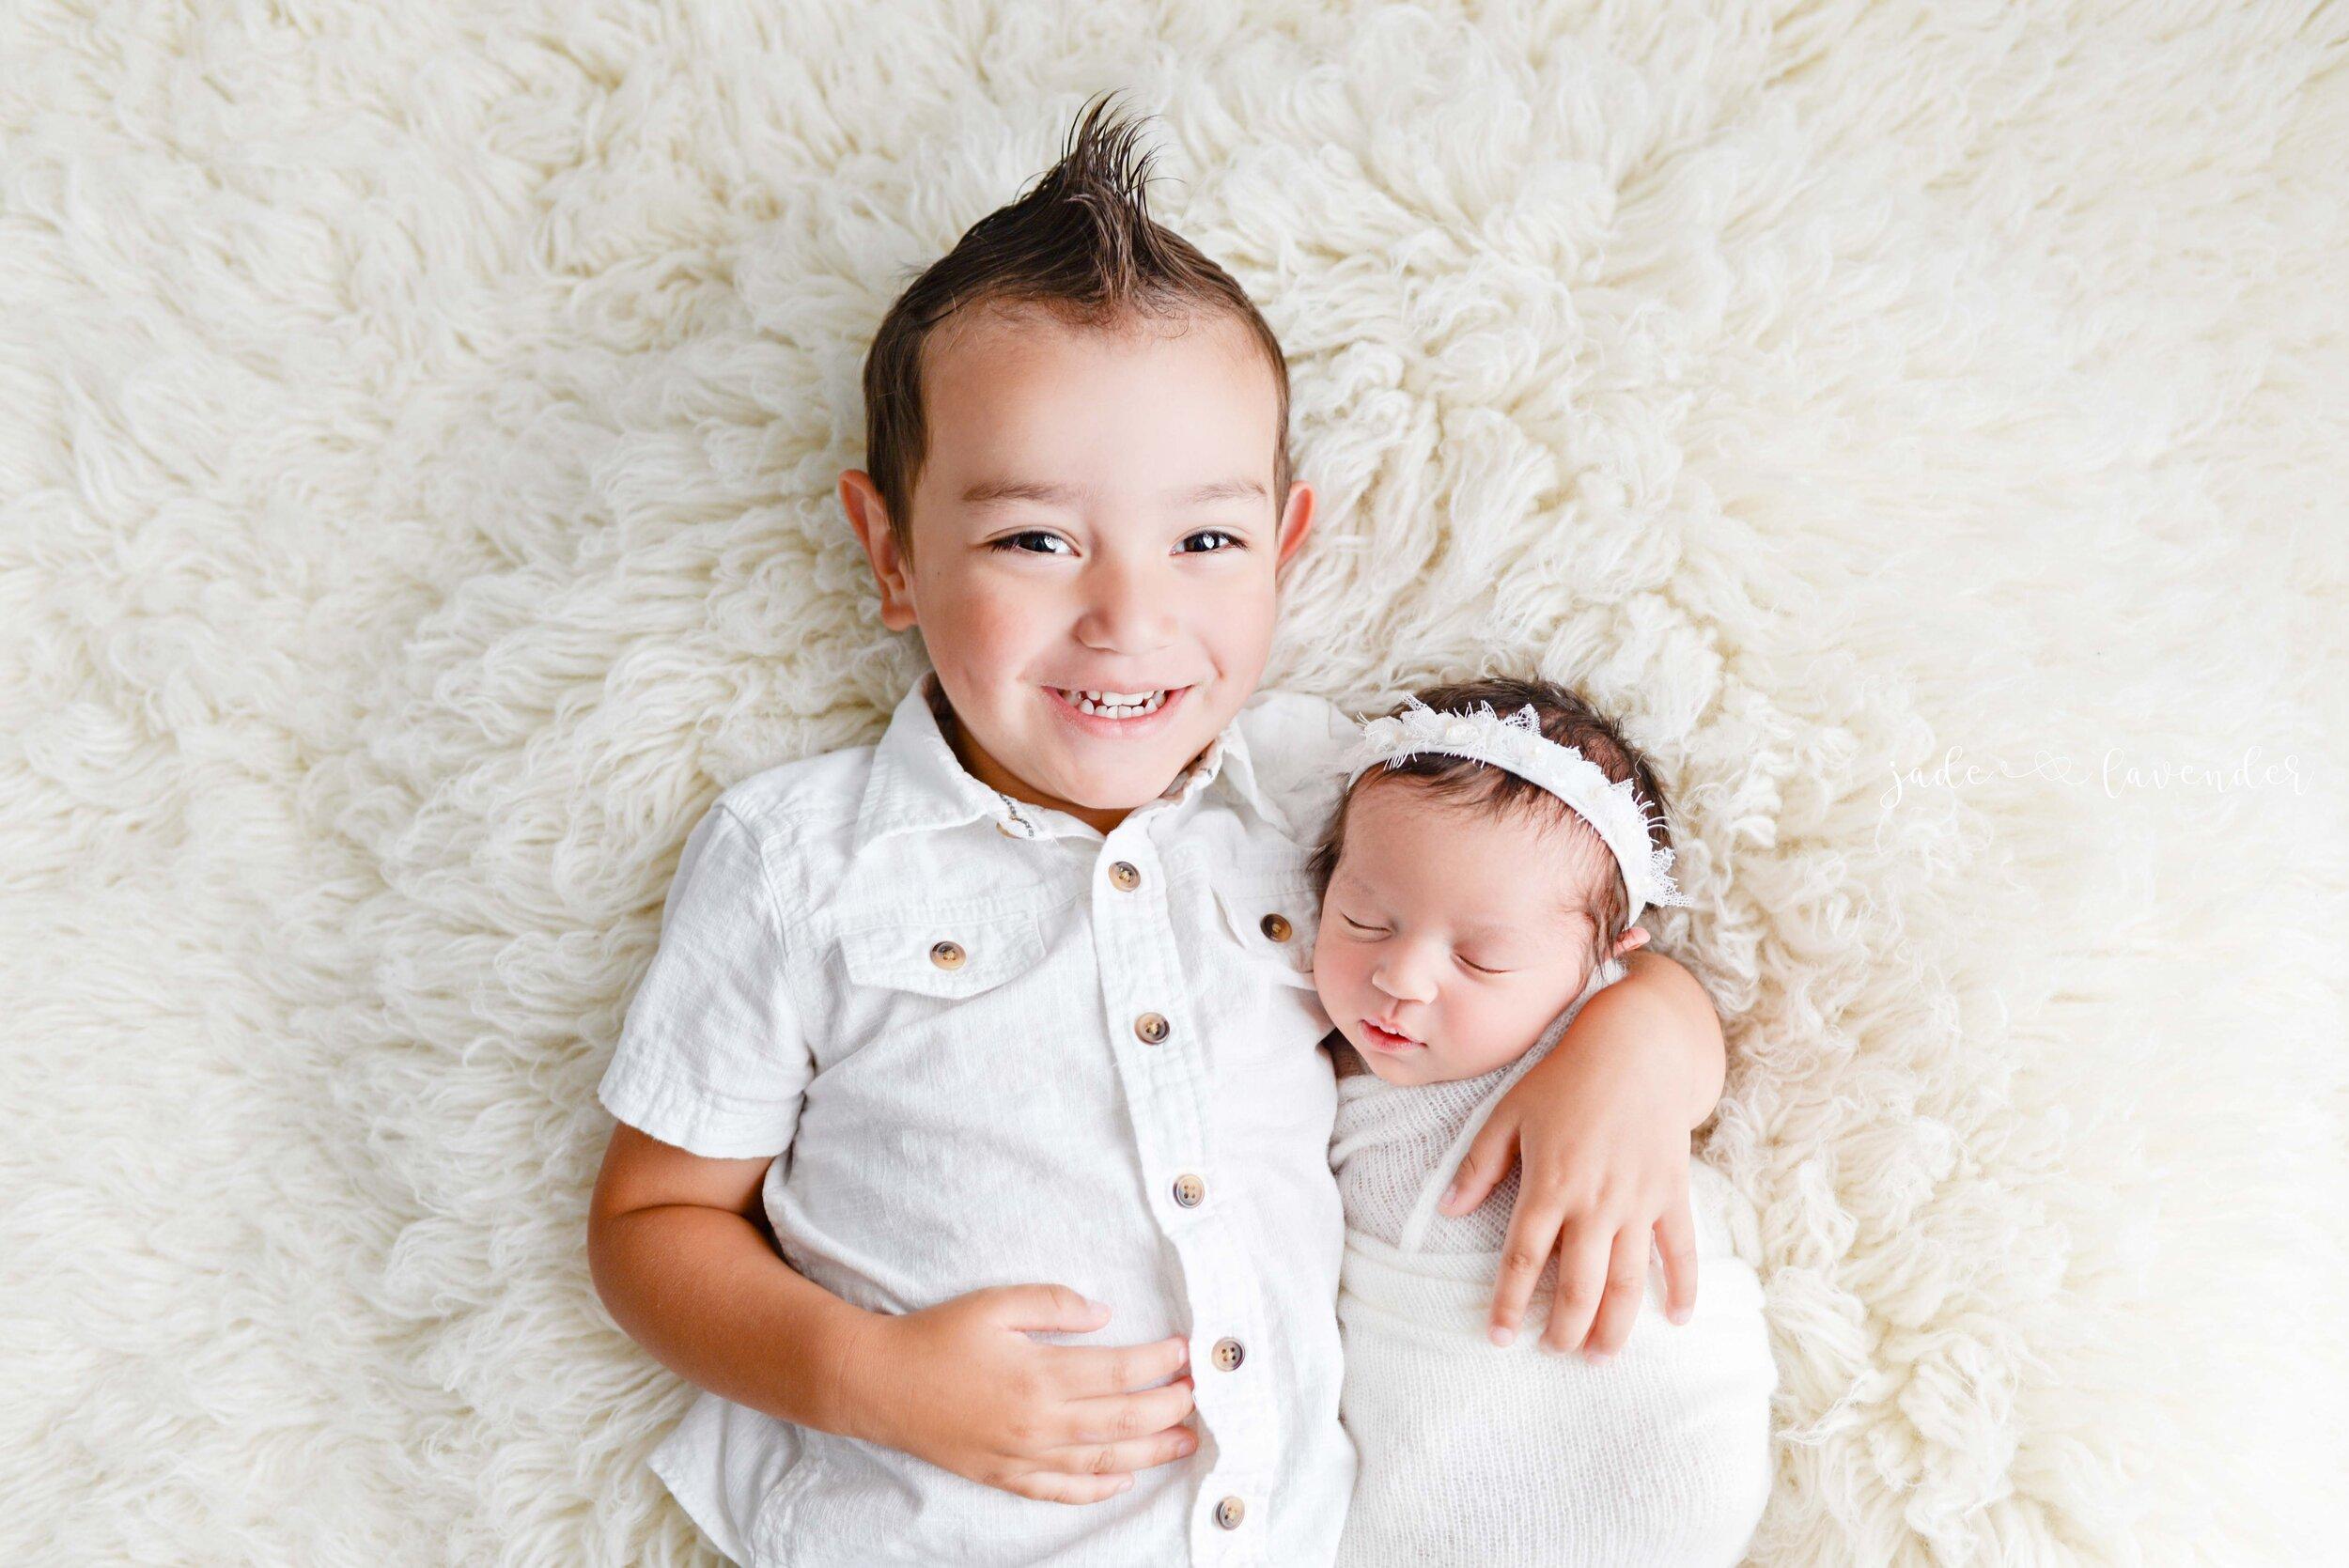 Newborn-images-baby-photography-infant-images-Newborn-photographer-spokane-washington-baby-girl (2 of 11).jpg